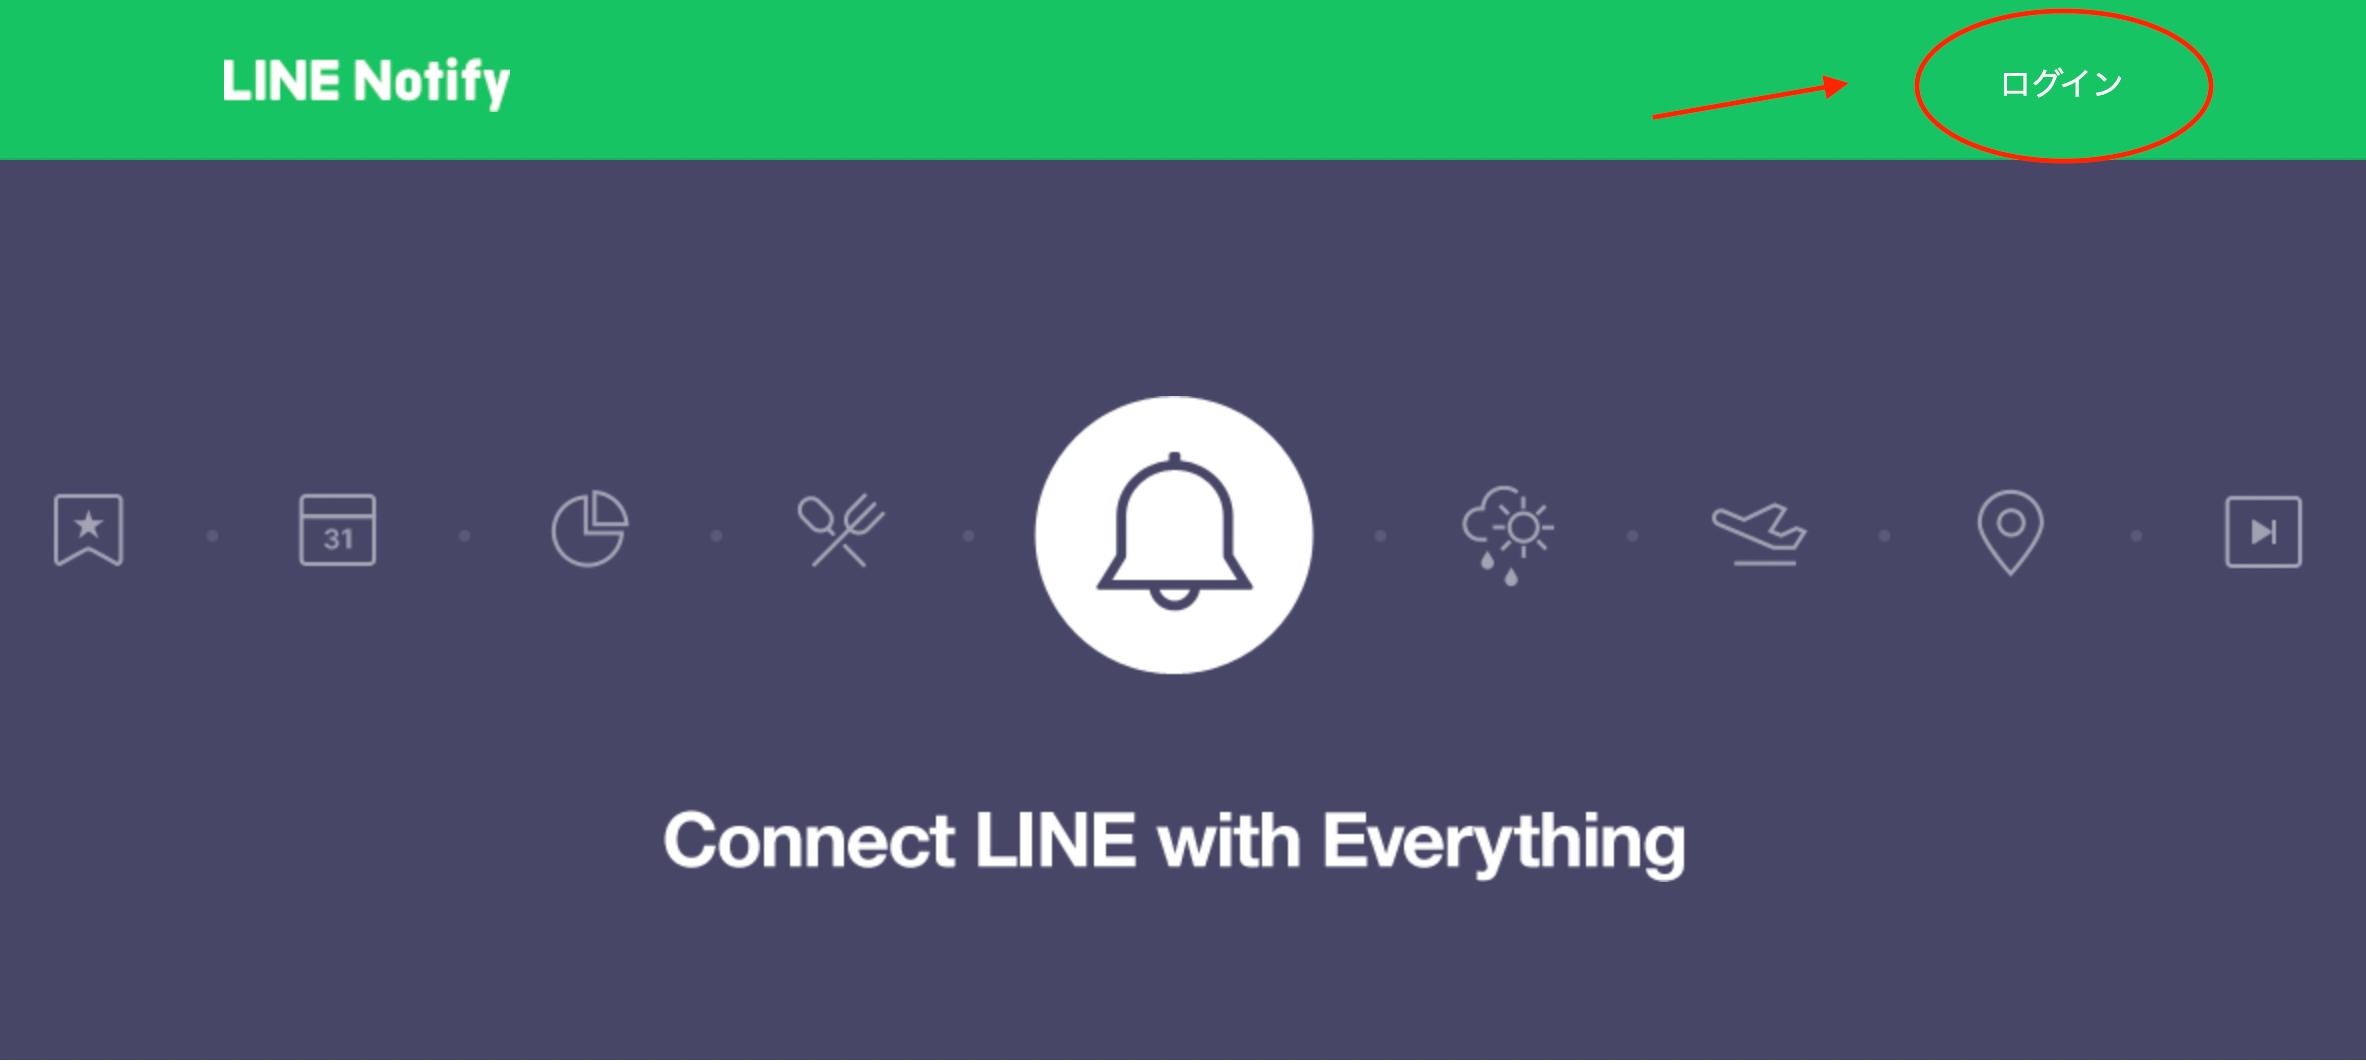 LINENotify1